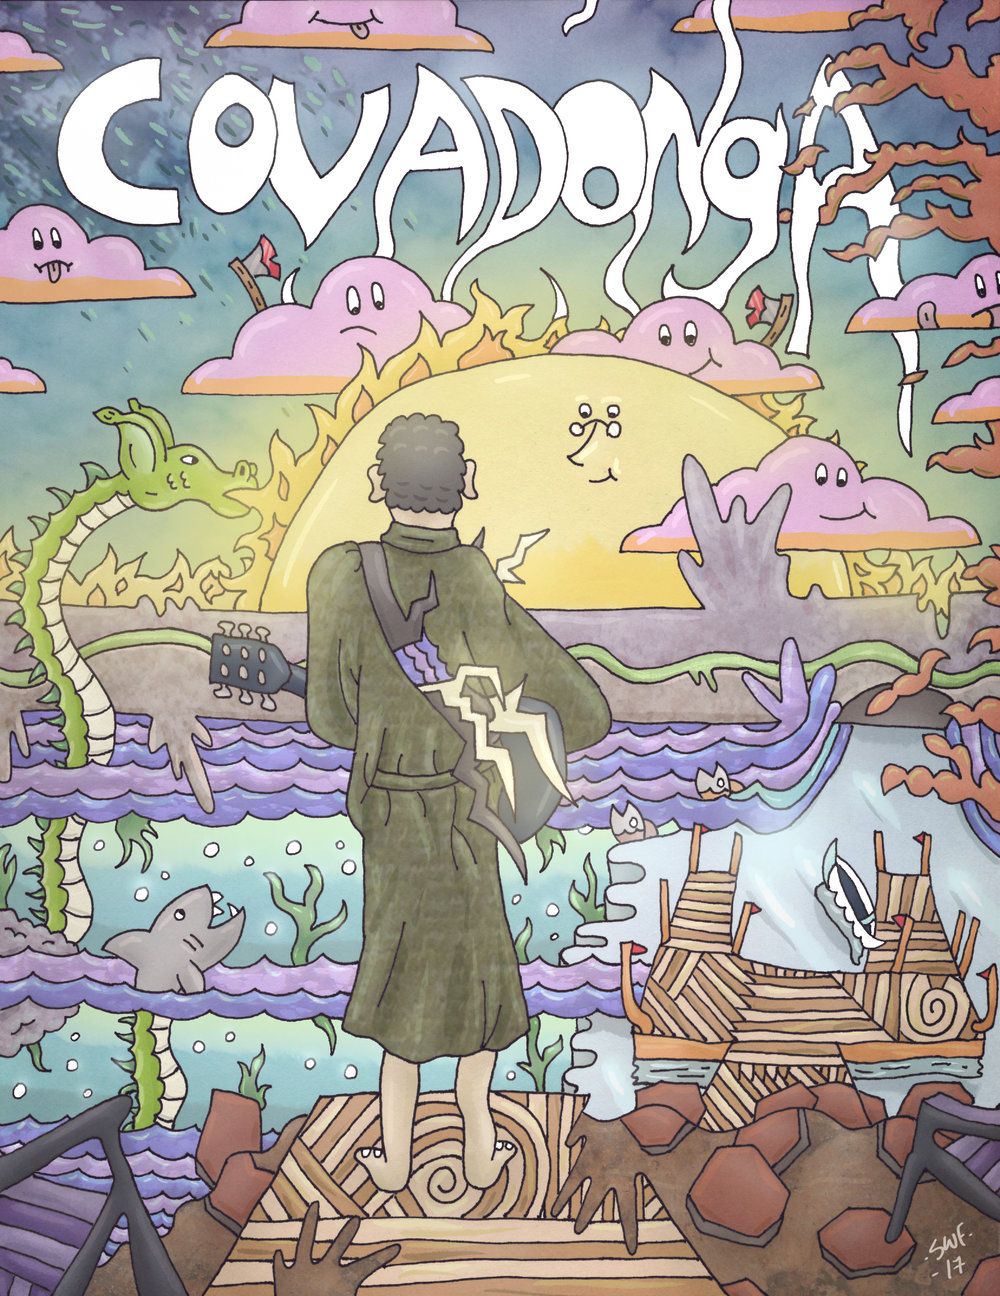 Covadonga film poster 2017